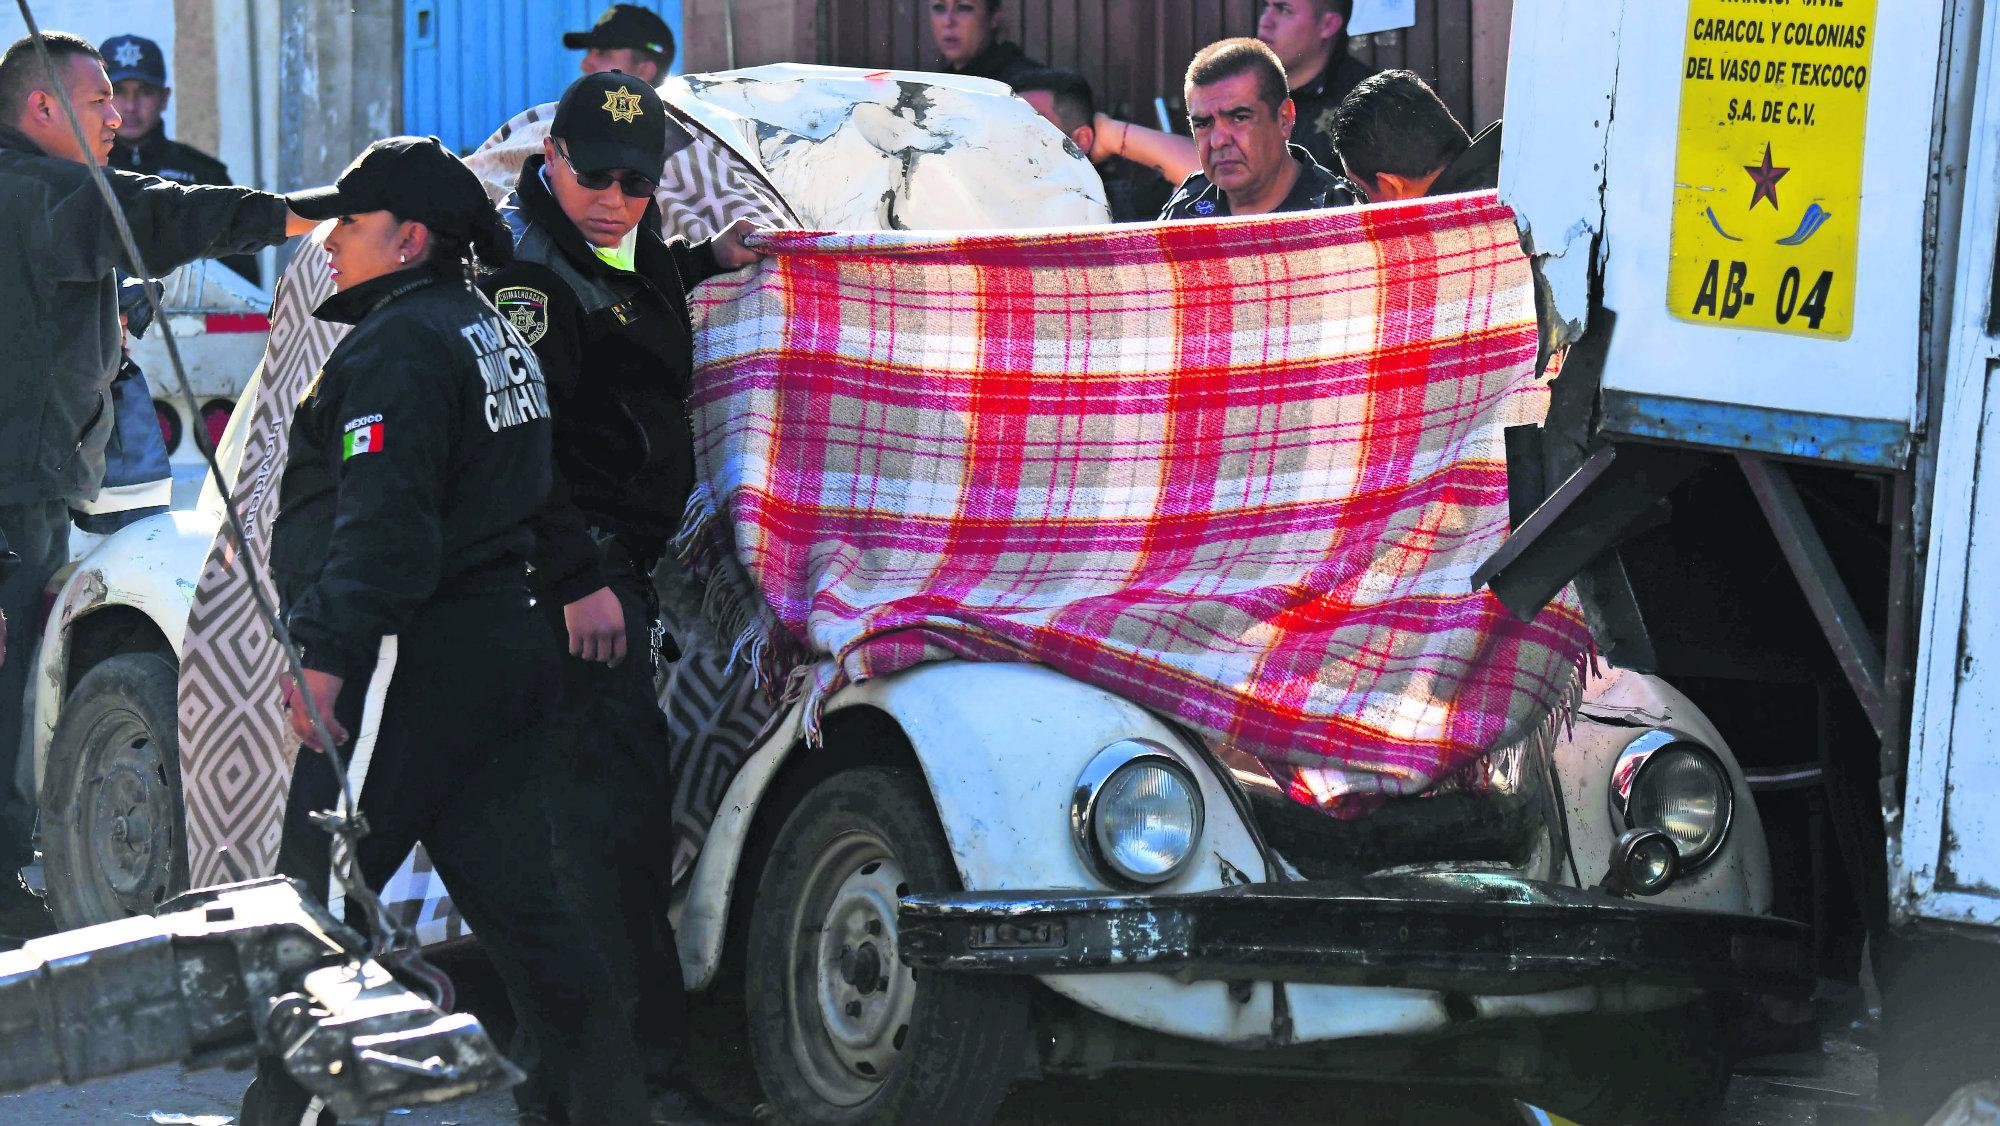 Chaco Vochito Chimalhuacán Policía Muere